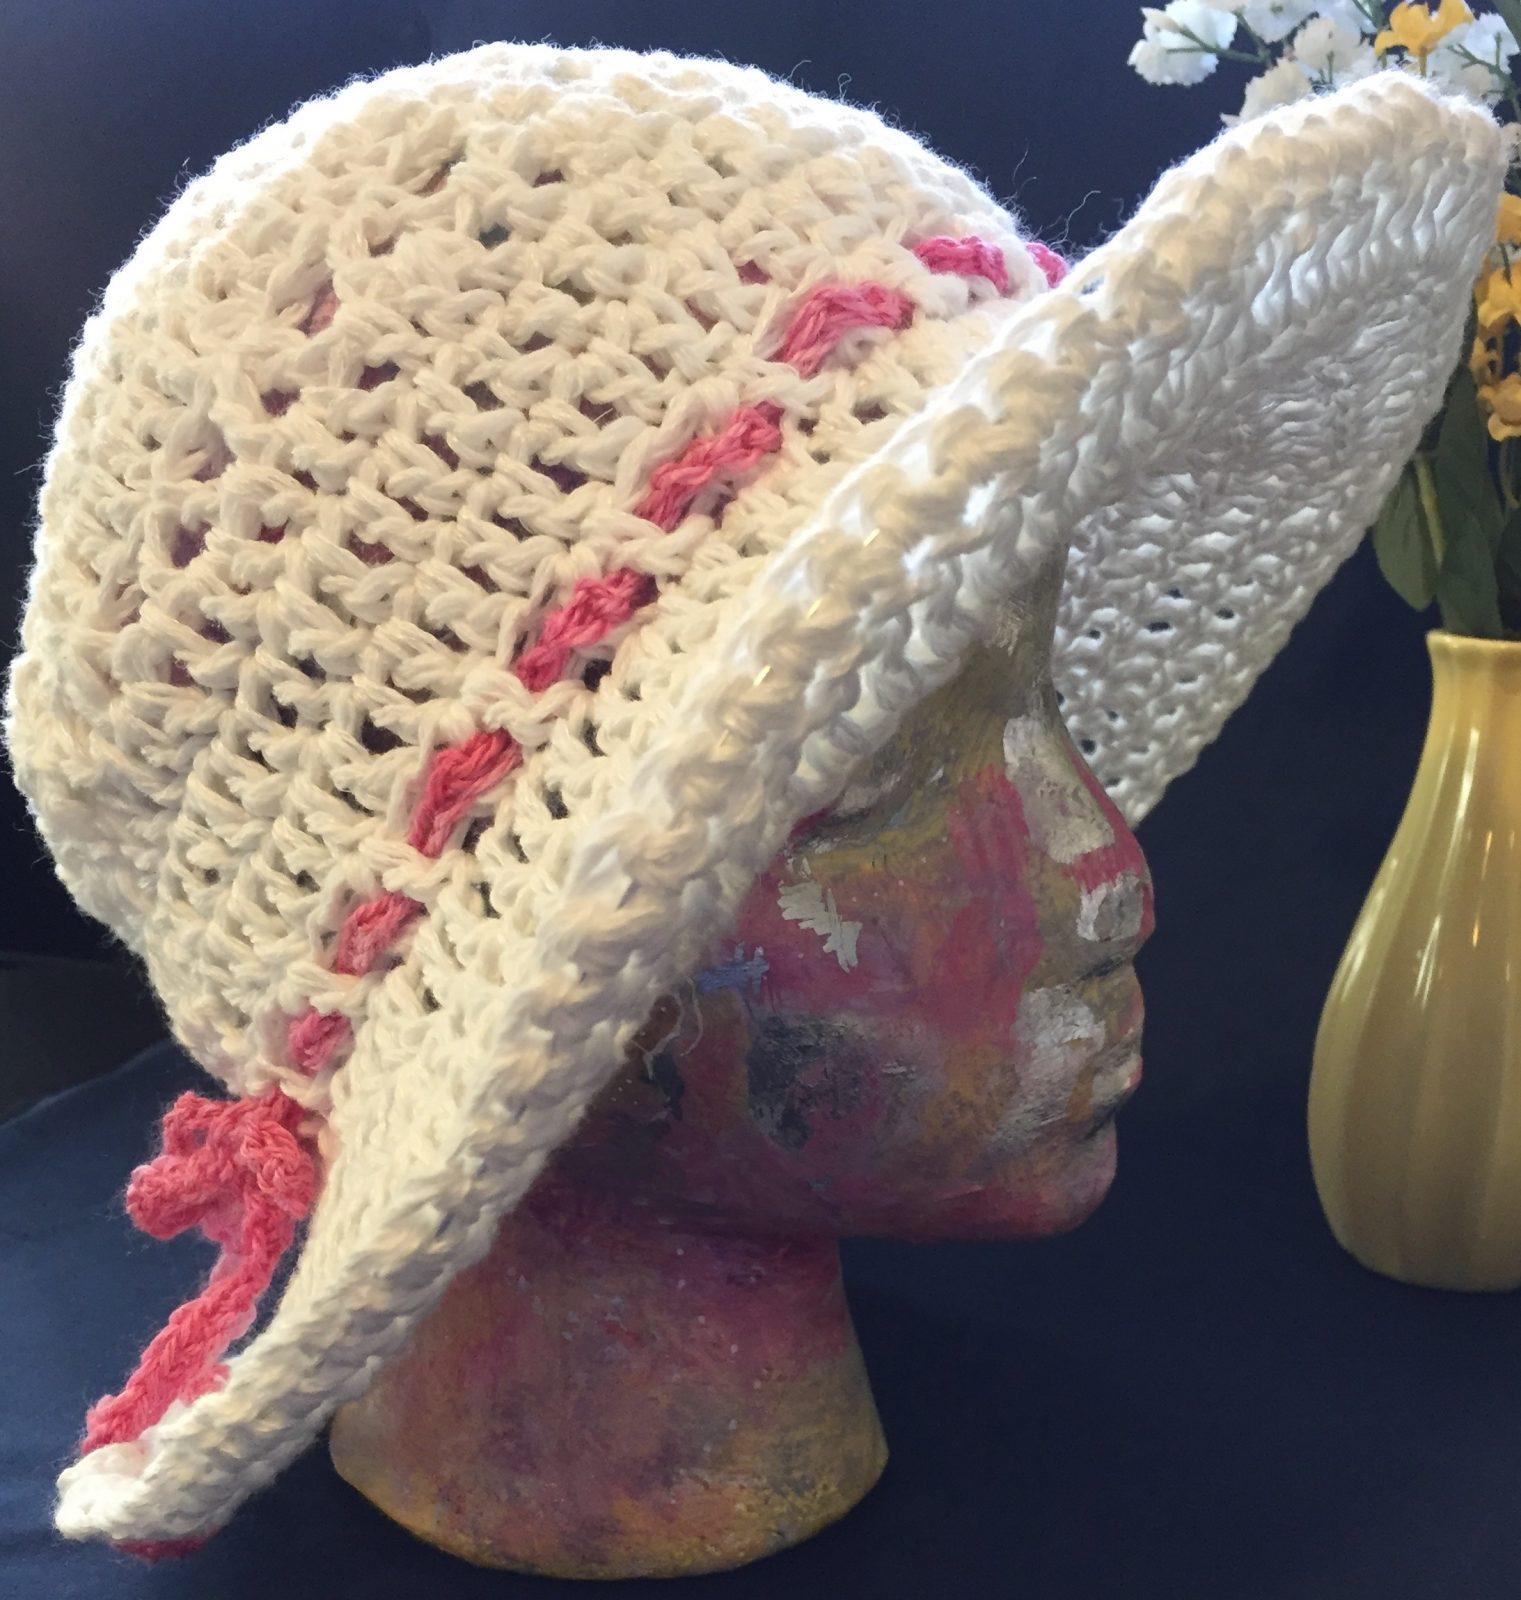 de92687d0b502 Crocheted Sun Hat Workshop  June 13th